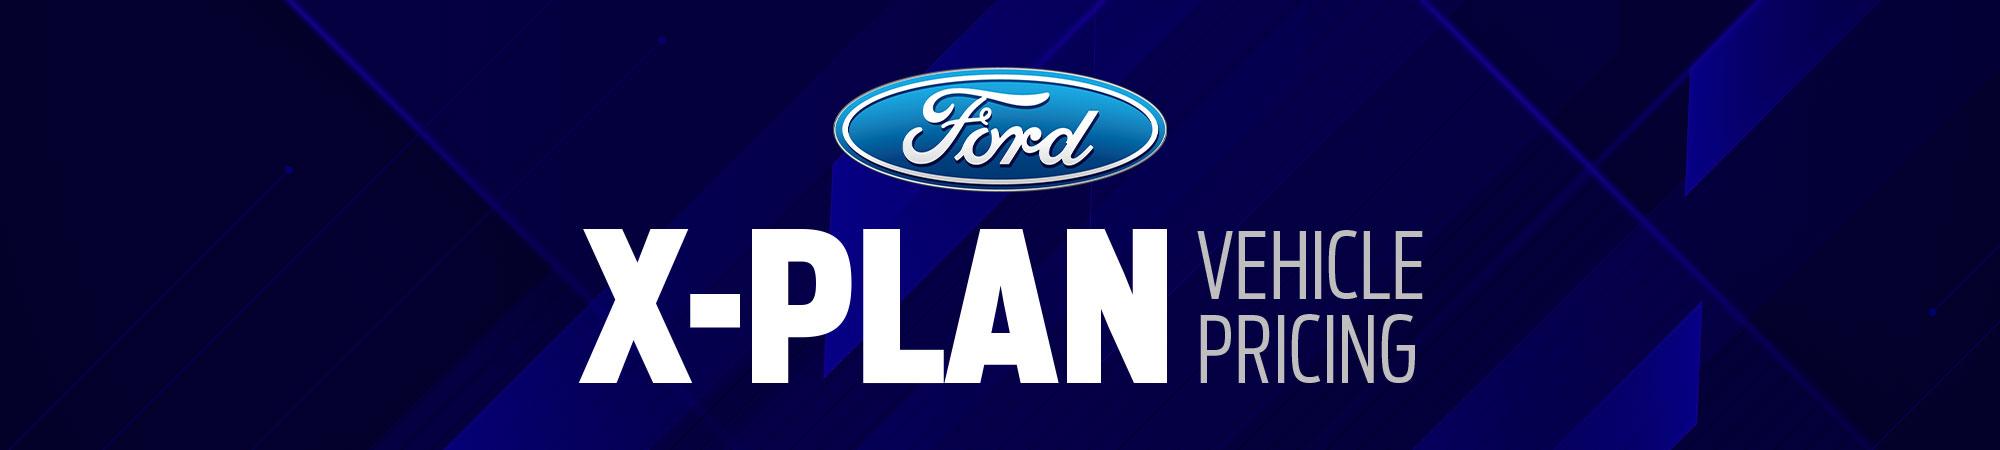 Ford X Plan